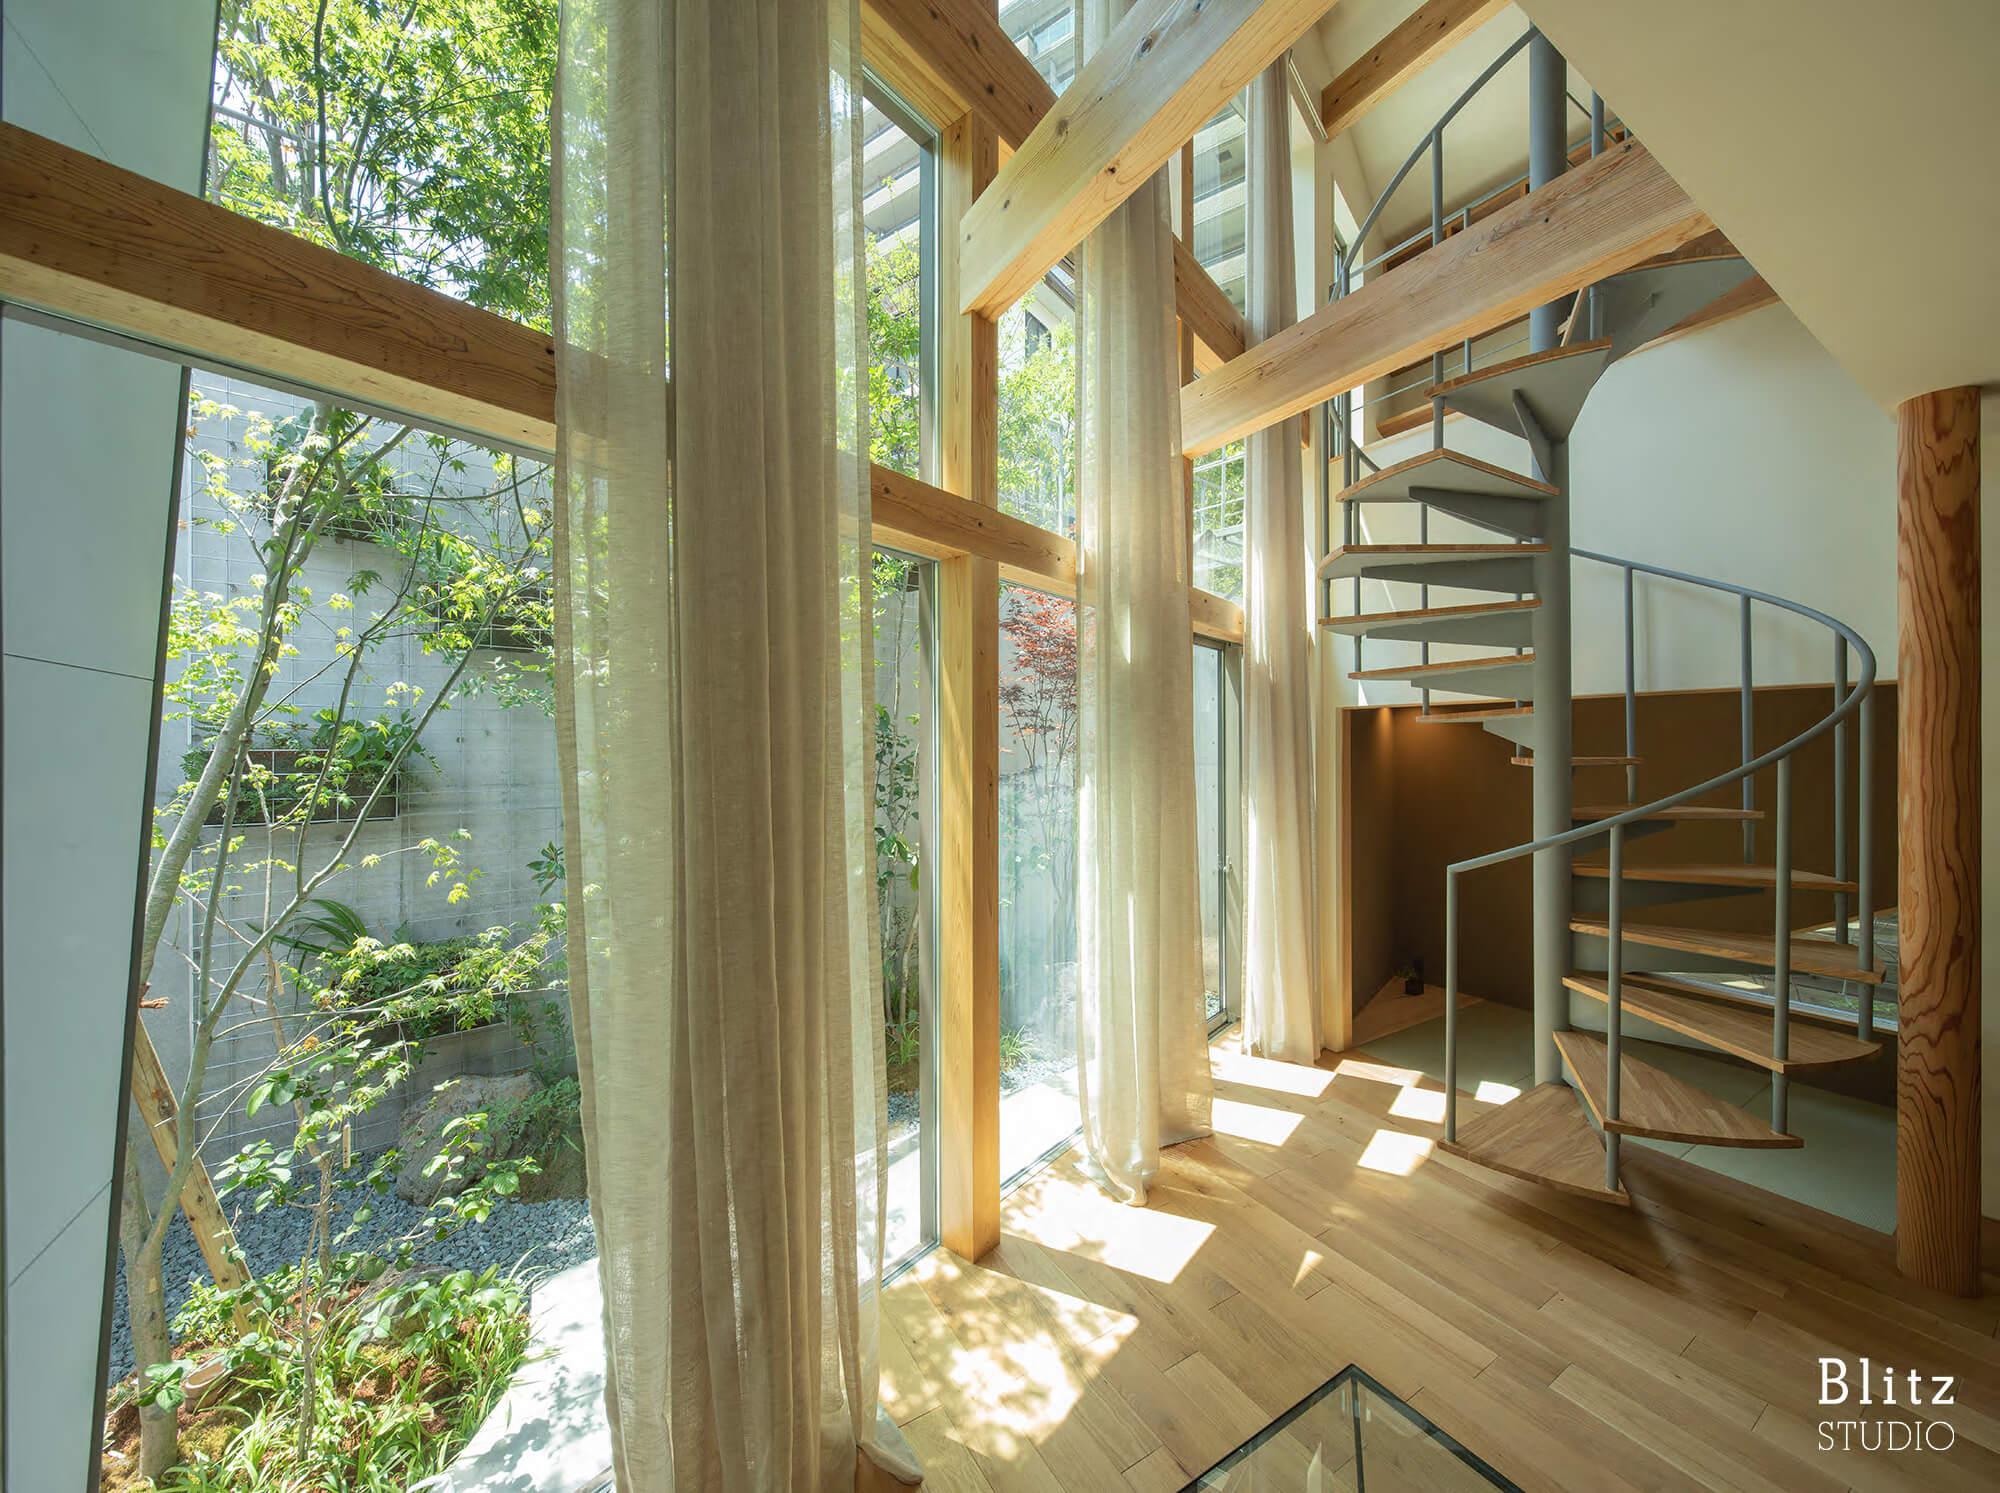 『赤坂の家』-福岡県福岡市-建築写真・竣工写真・インテリア写真4